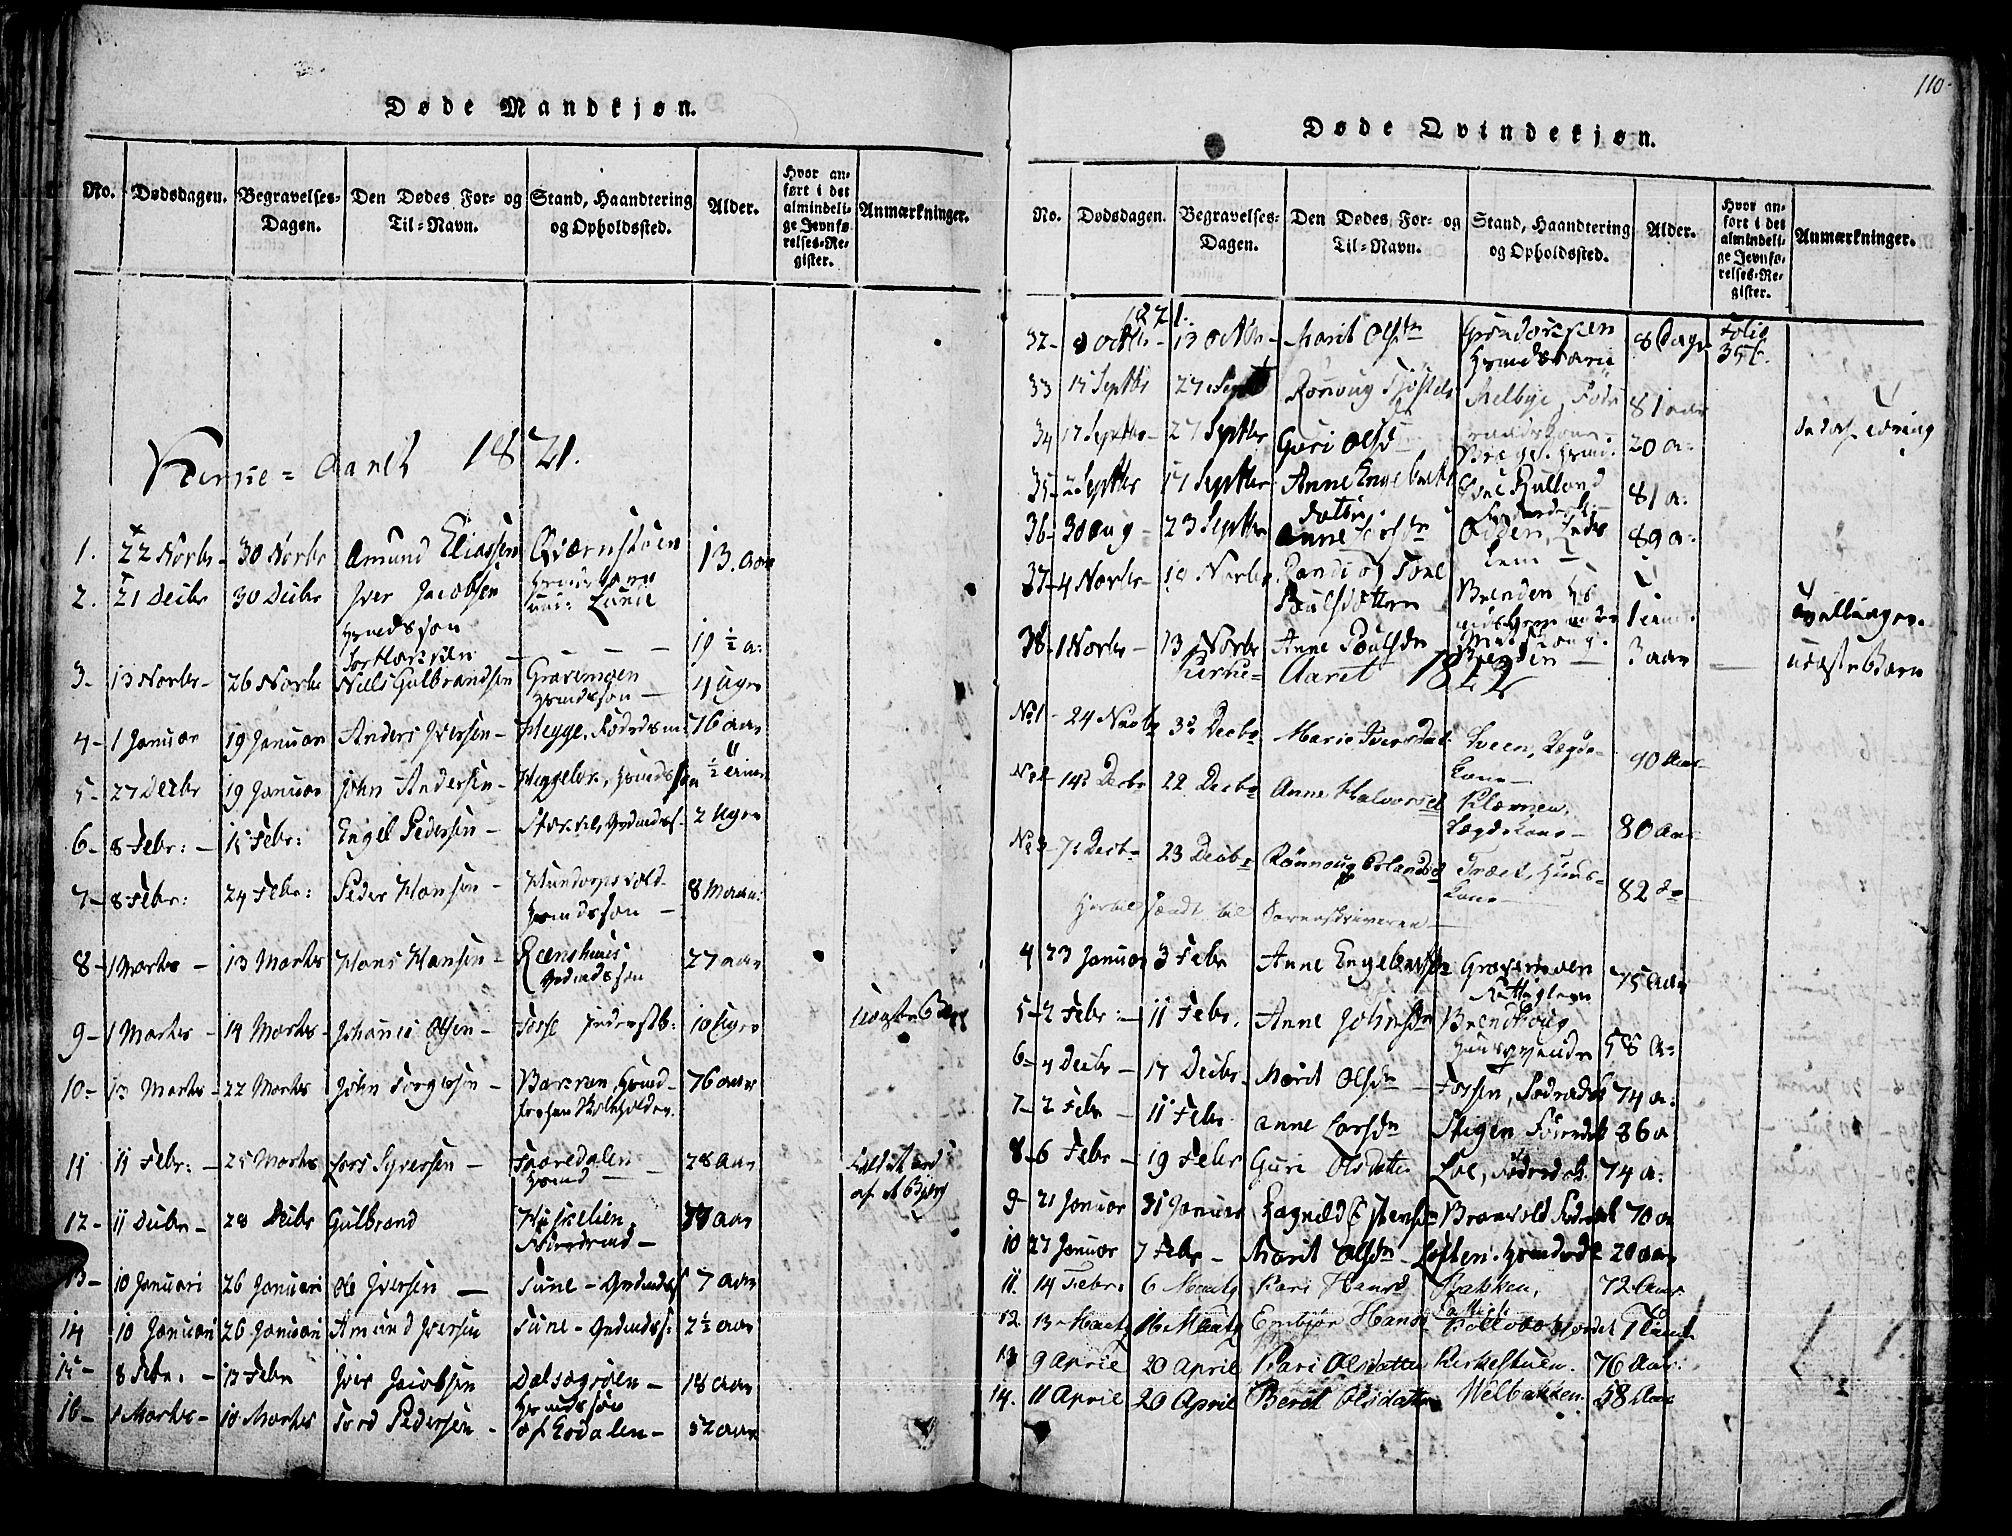 SAH, Fron prestekontor, H/Ha/Haa/L0002: Ministerialbok nr. 2, 1816-1827, s. 110